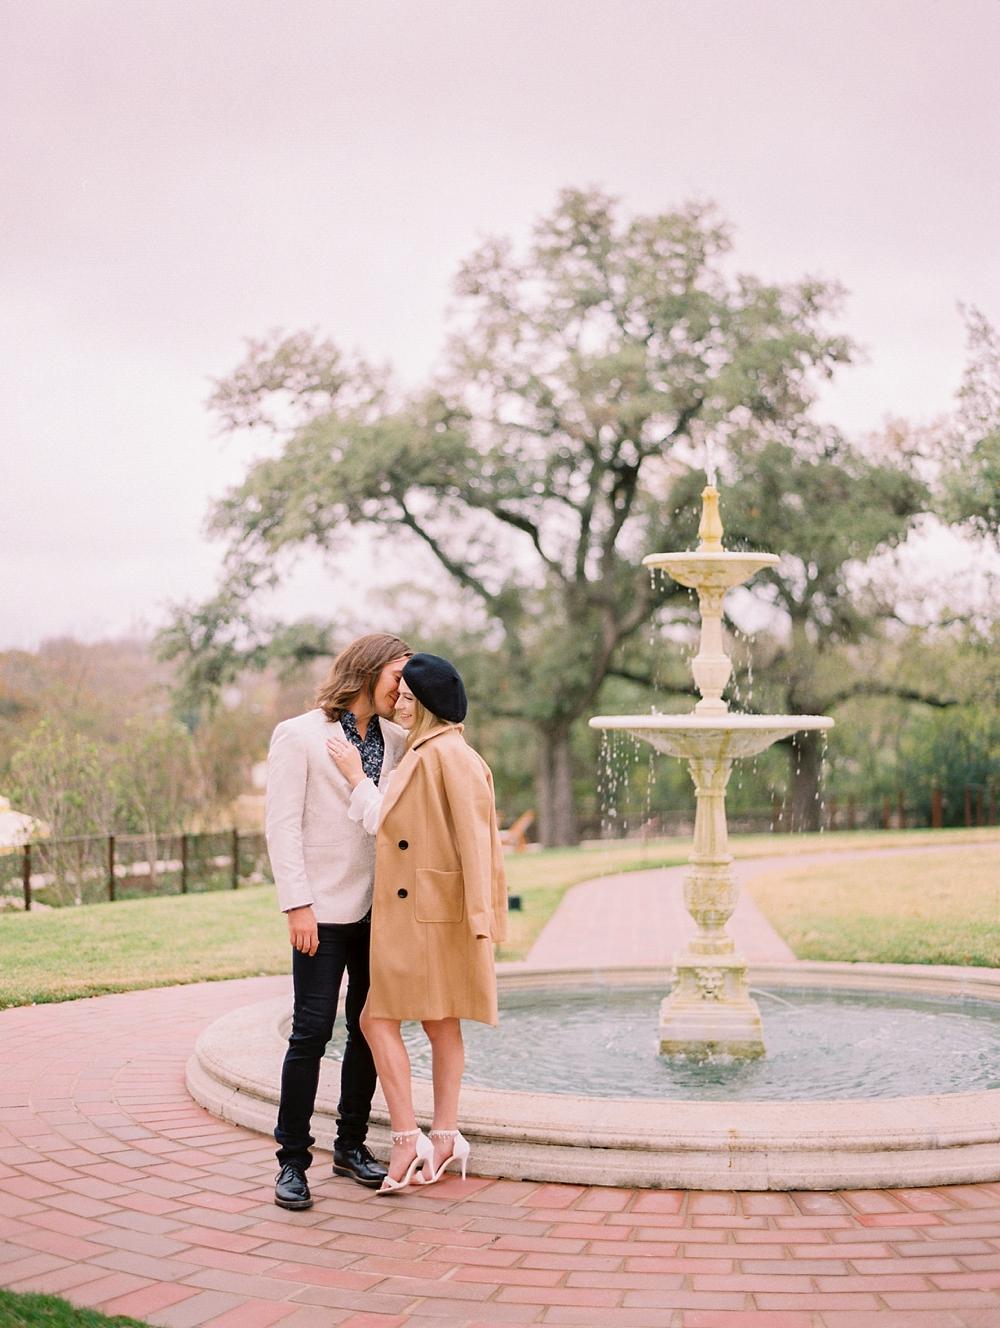 kristin-la-voie-photography-Austin-Wedding-Boudoir-Photographer-Commodore-Perry-Estate-21